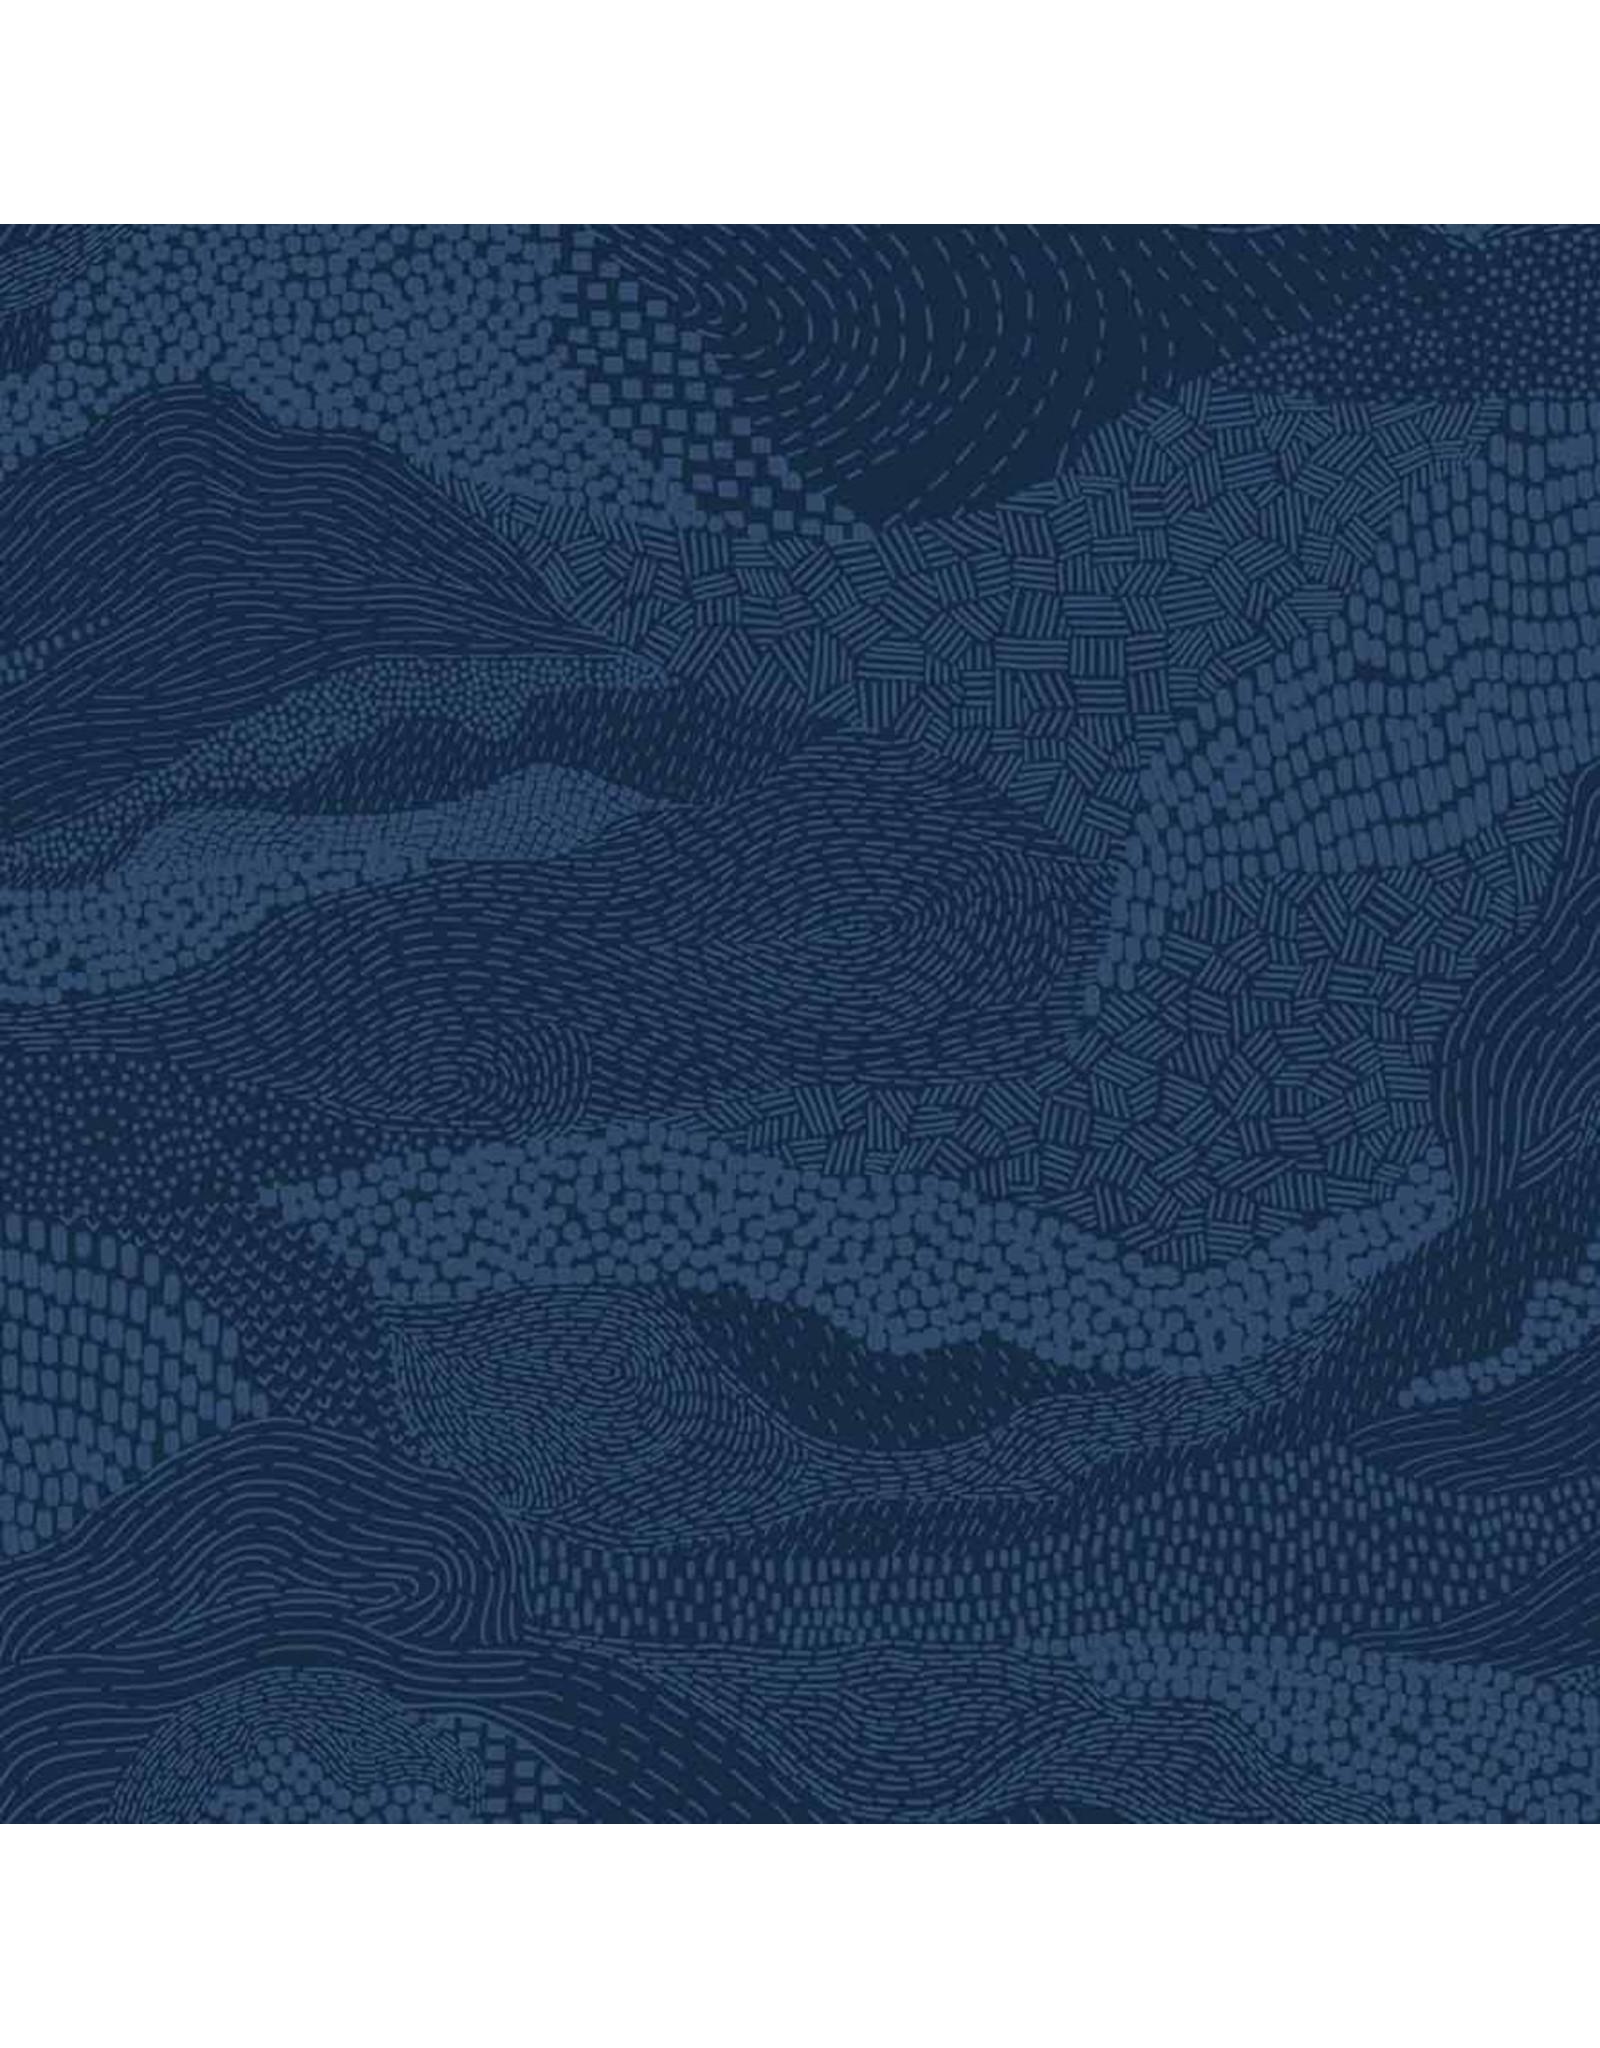 Figo Elements, Earth in Navy, Fabric Half-Yards